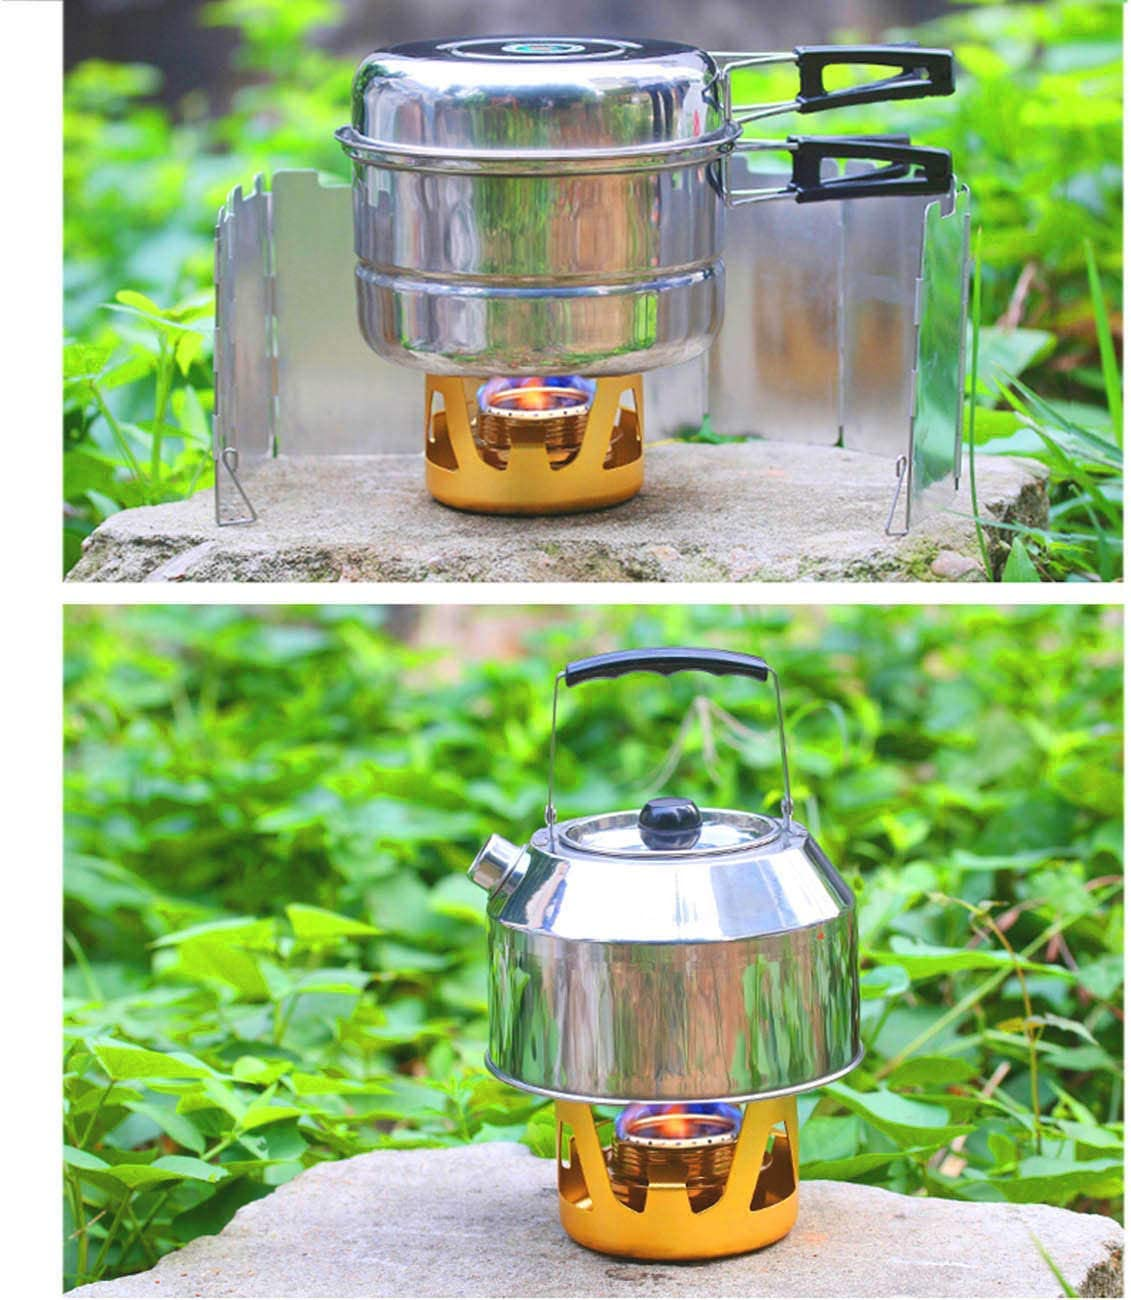 senderismo mochilero ShineTool Mini quemador de alcohol port/átil para campamento cocina temperatura ajustable para acampadas picnic